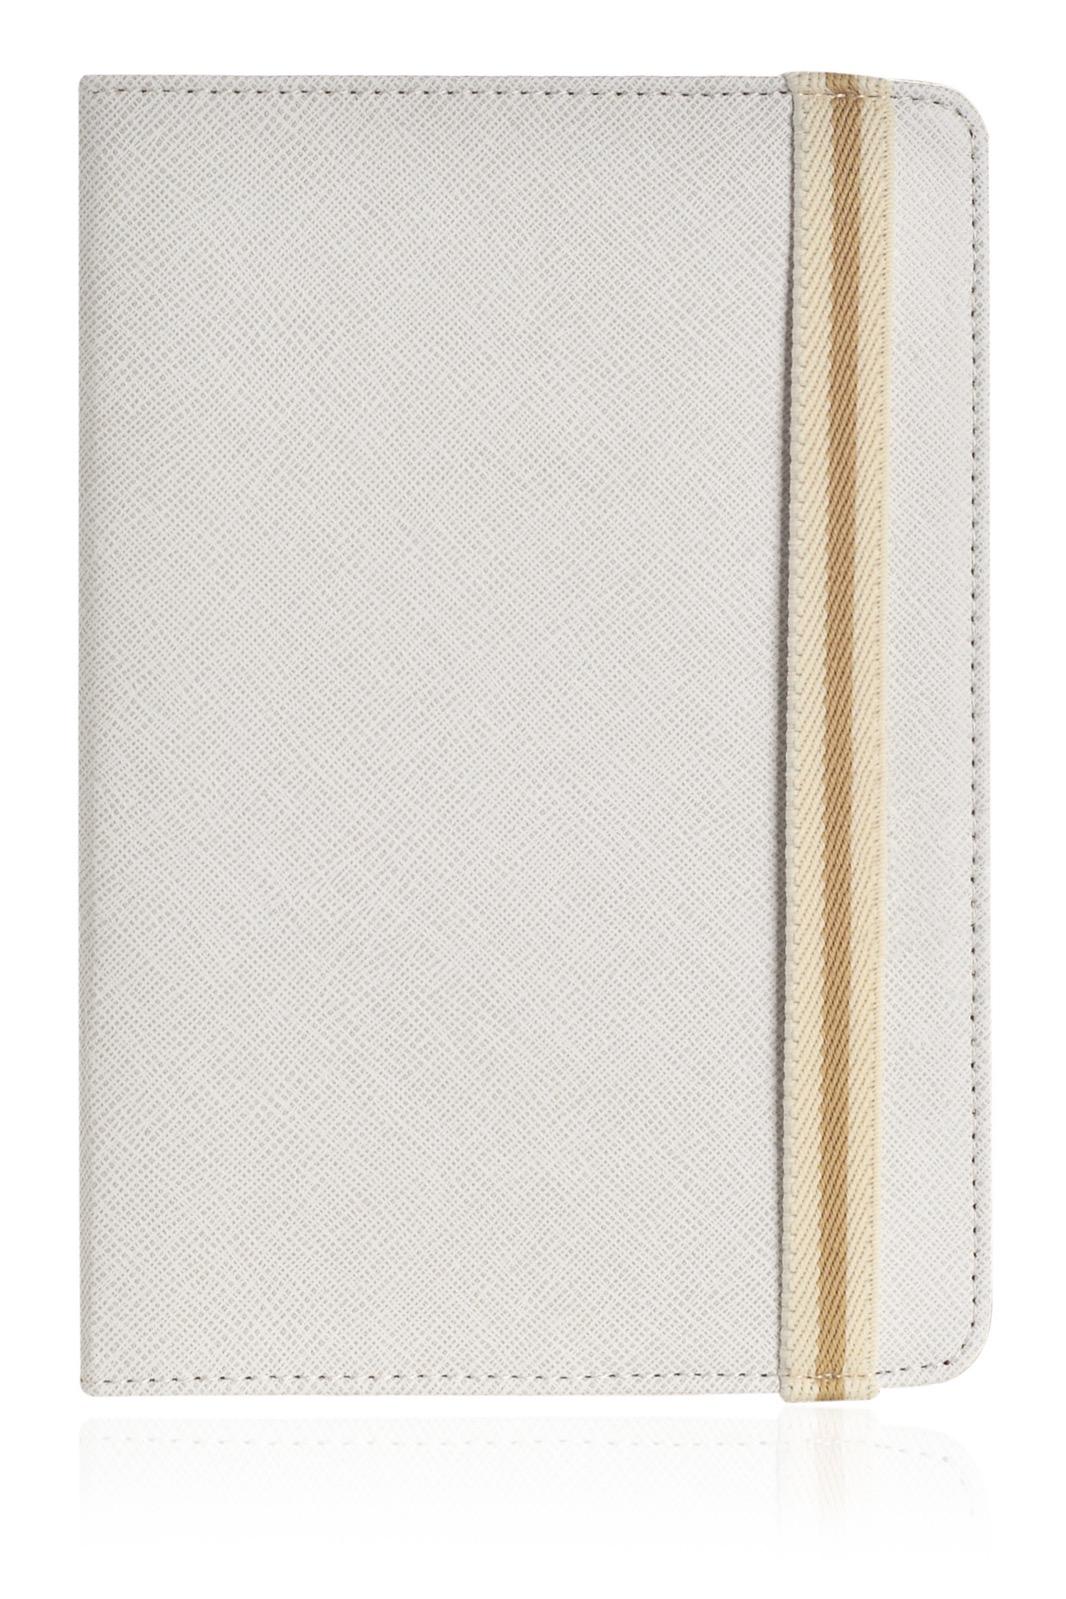 "Чехол для планшета iNeez книжка эко кожа 340048 для Samsung Galaxy Tab 7.7"", белый"